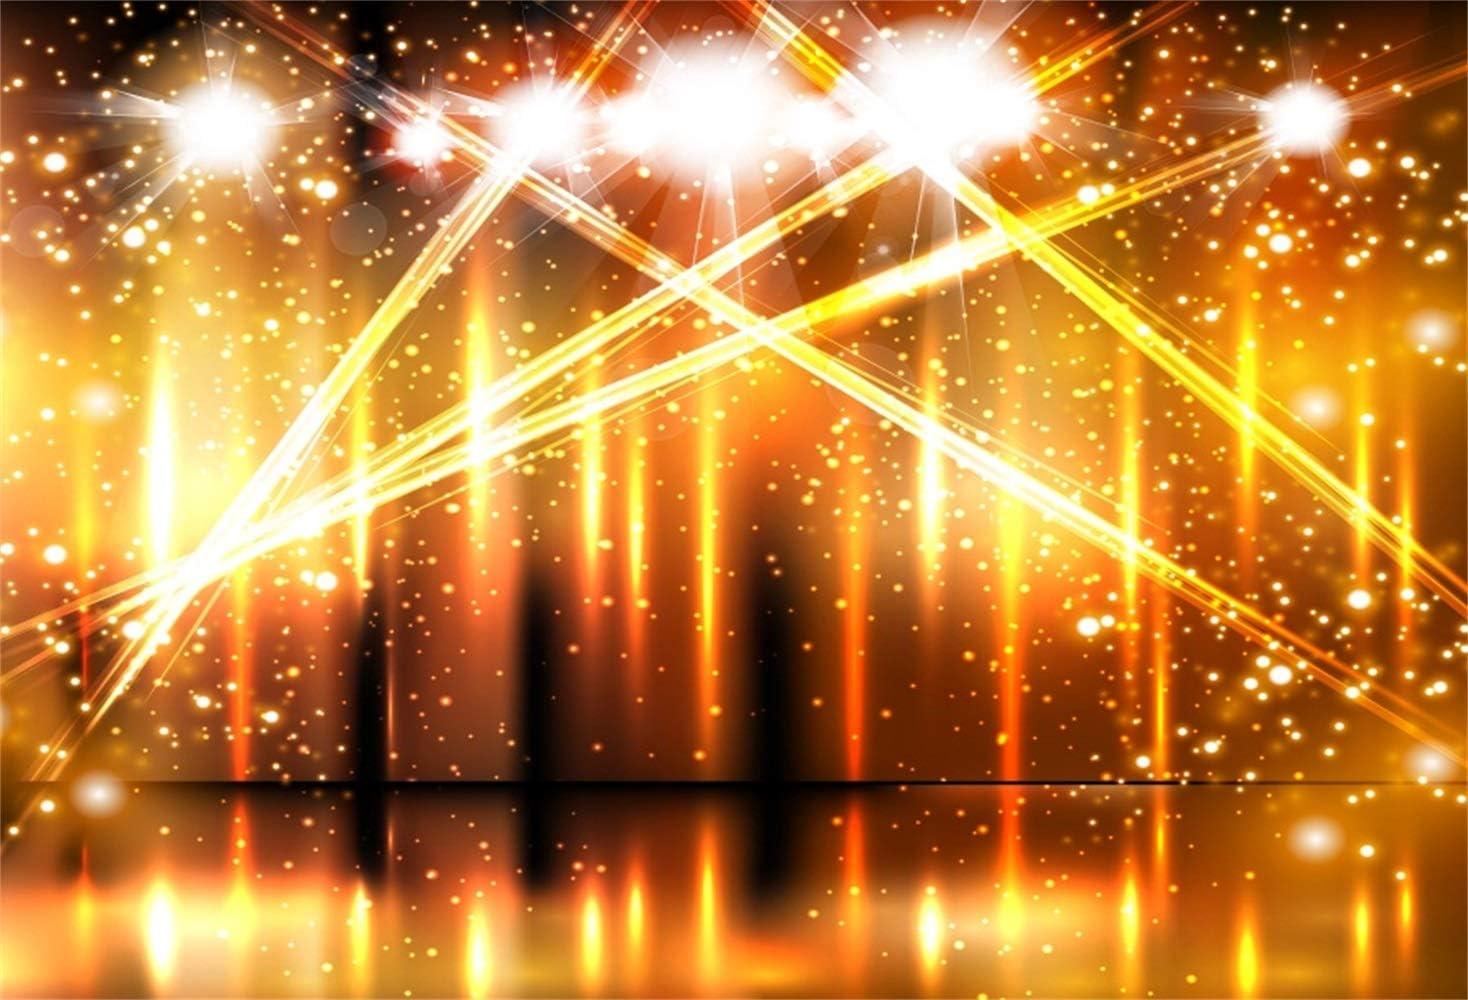 10x7ft Splendid Dreamlike Red Stage Backdrop Vinyl Dreamy Interlaced Spotlights Lightspots Photo Background Talent Show Performance Live Show TV Programming Banner Singer Portrait Shoot